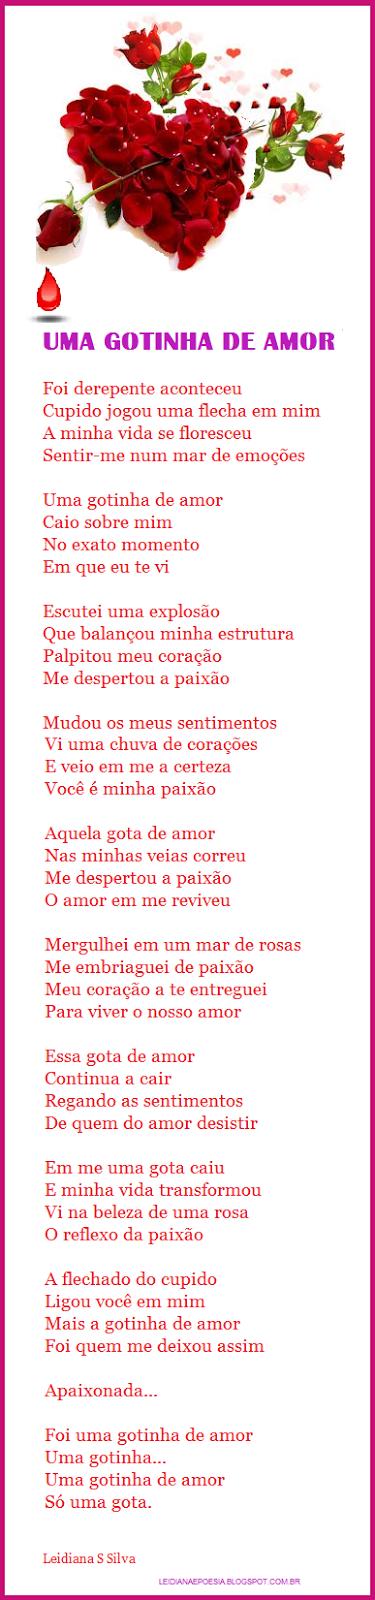 POESIA DE Leidiana S. Silva